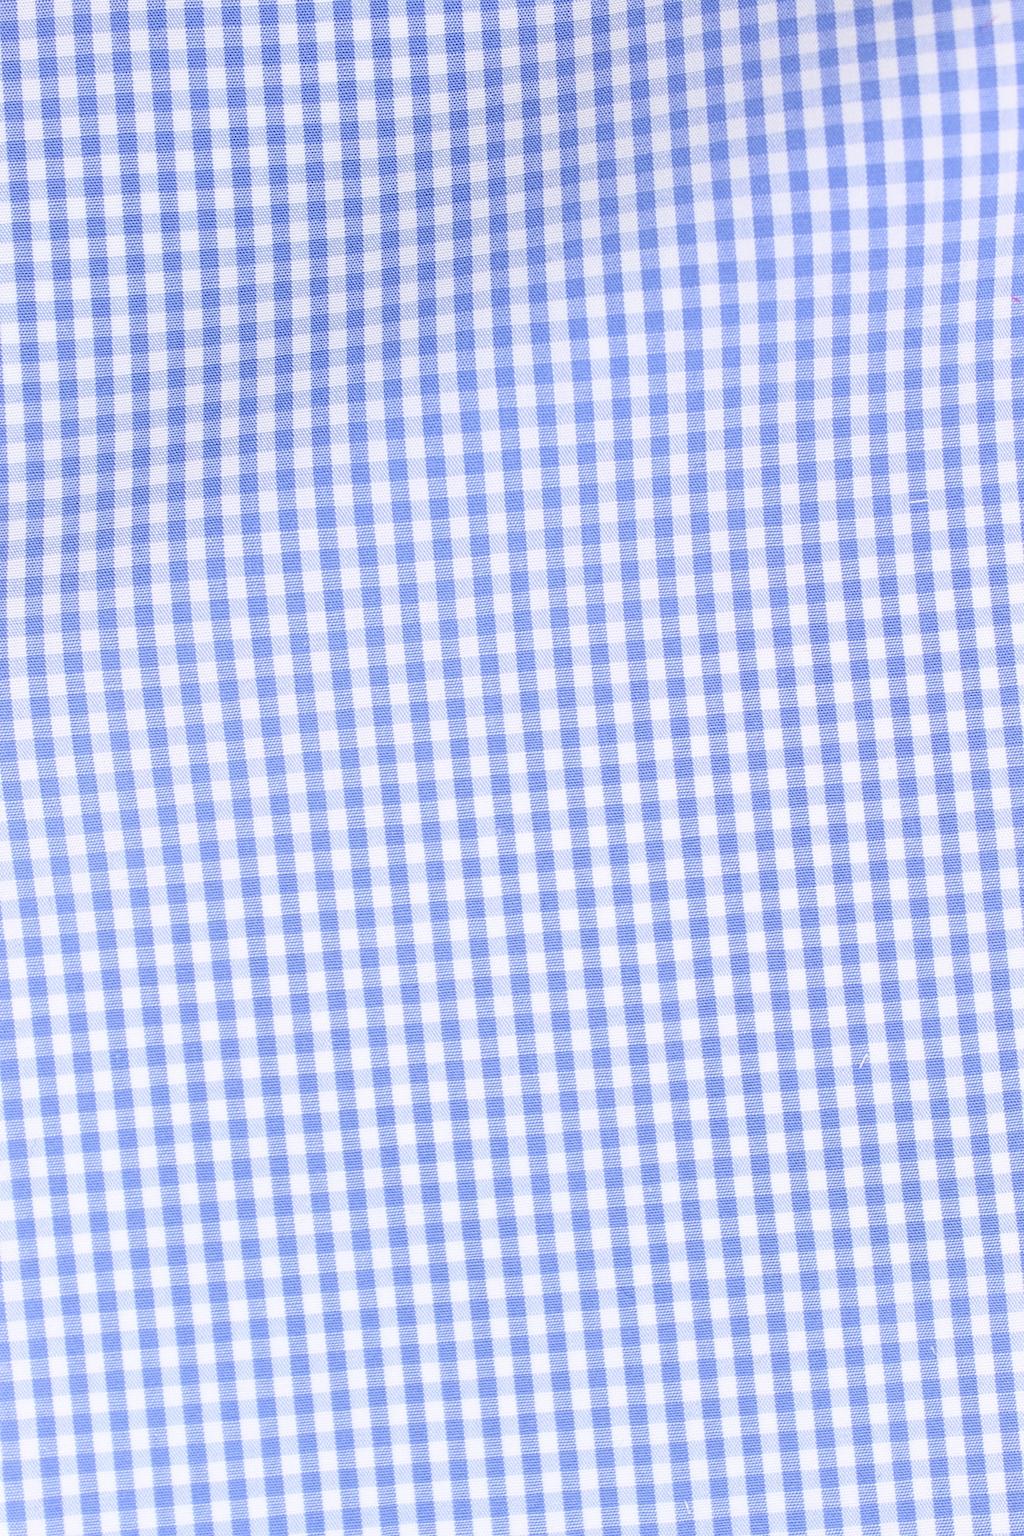 6609 Baby Blue Gingham.JPG